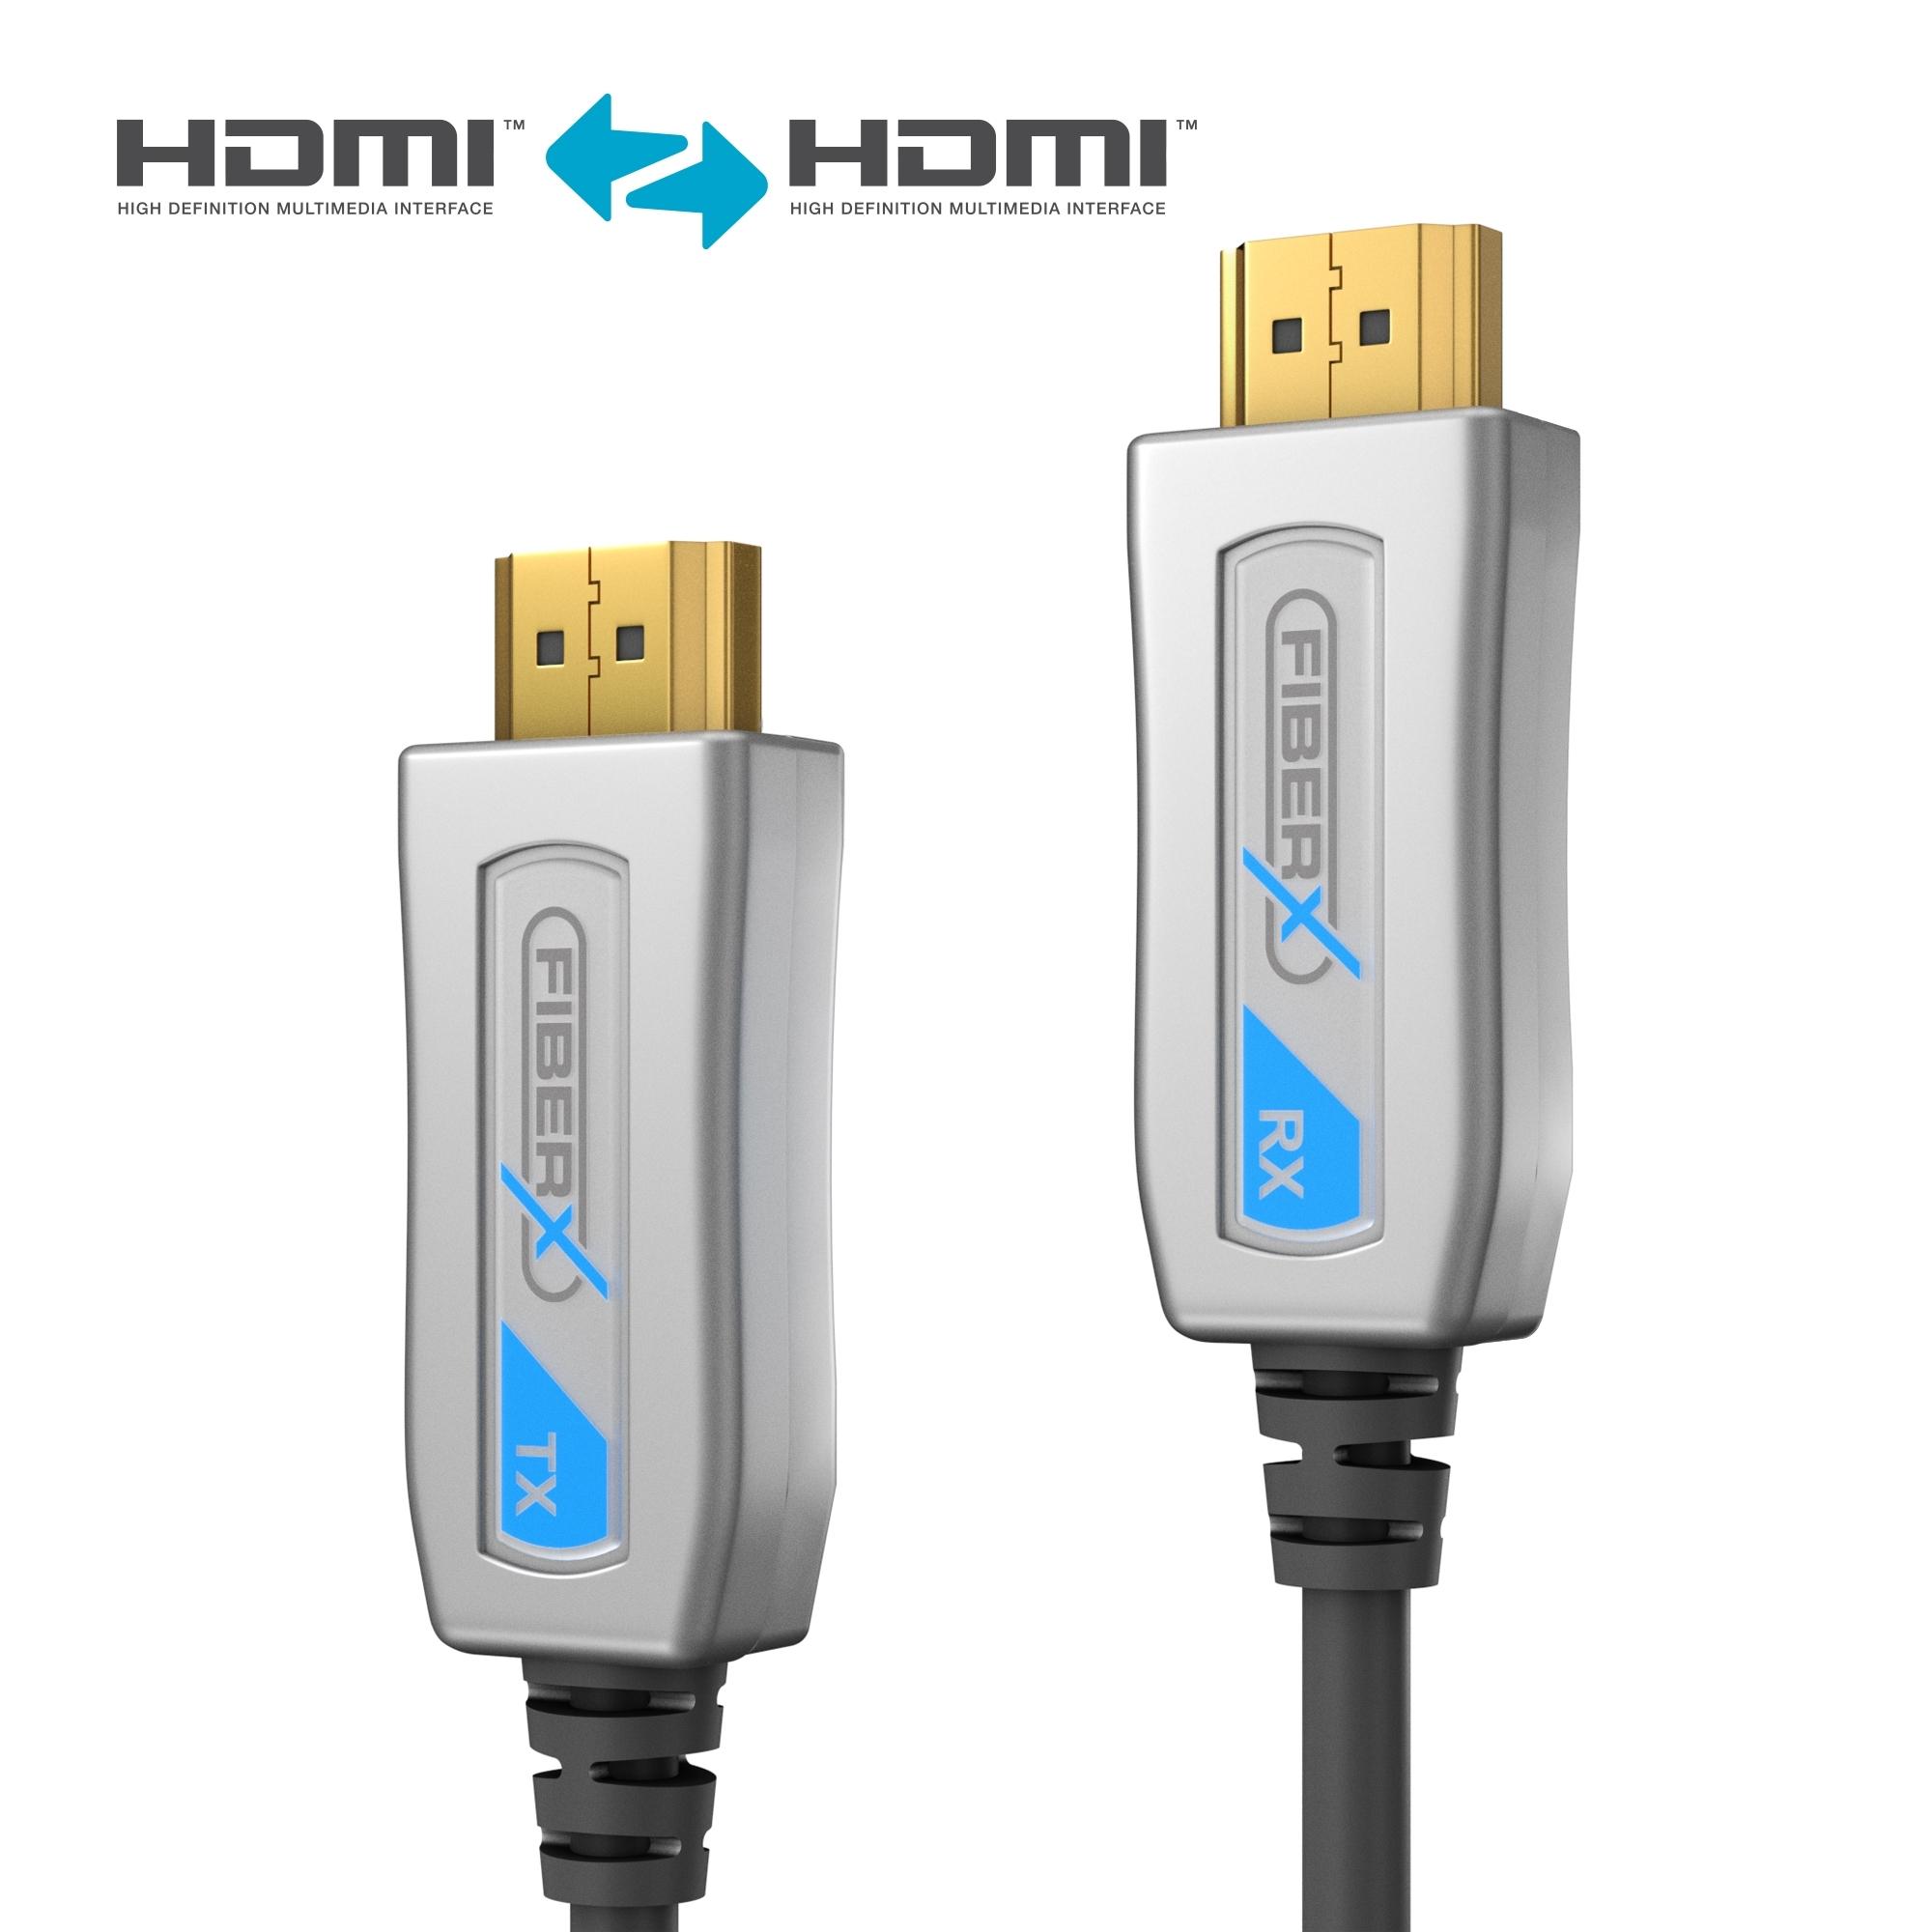 Gallery Retail Kabel HDMI 1 3 15m Source · FiberX Series Active HDMI 4K Fiber Extender Cable Integrated 15m PureLink English